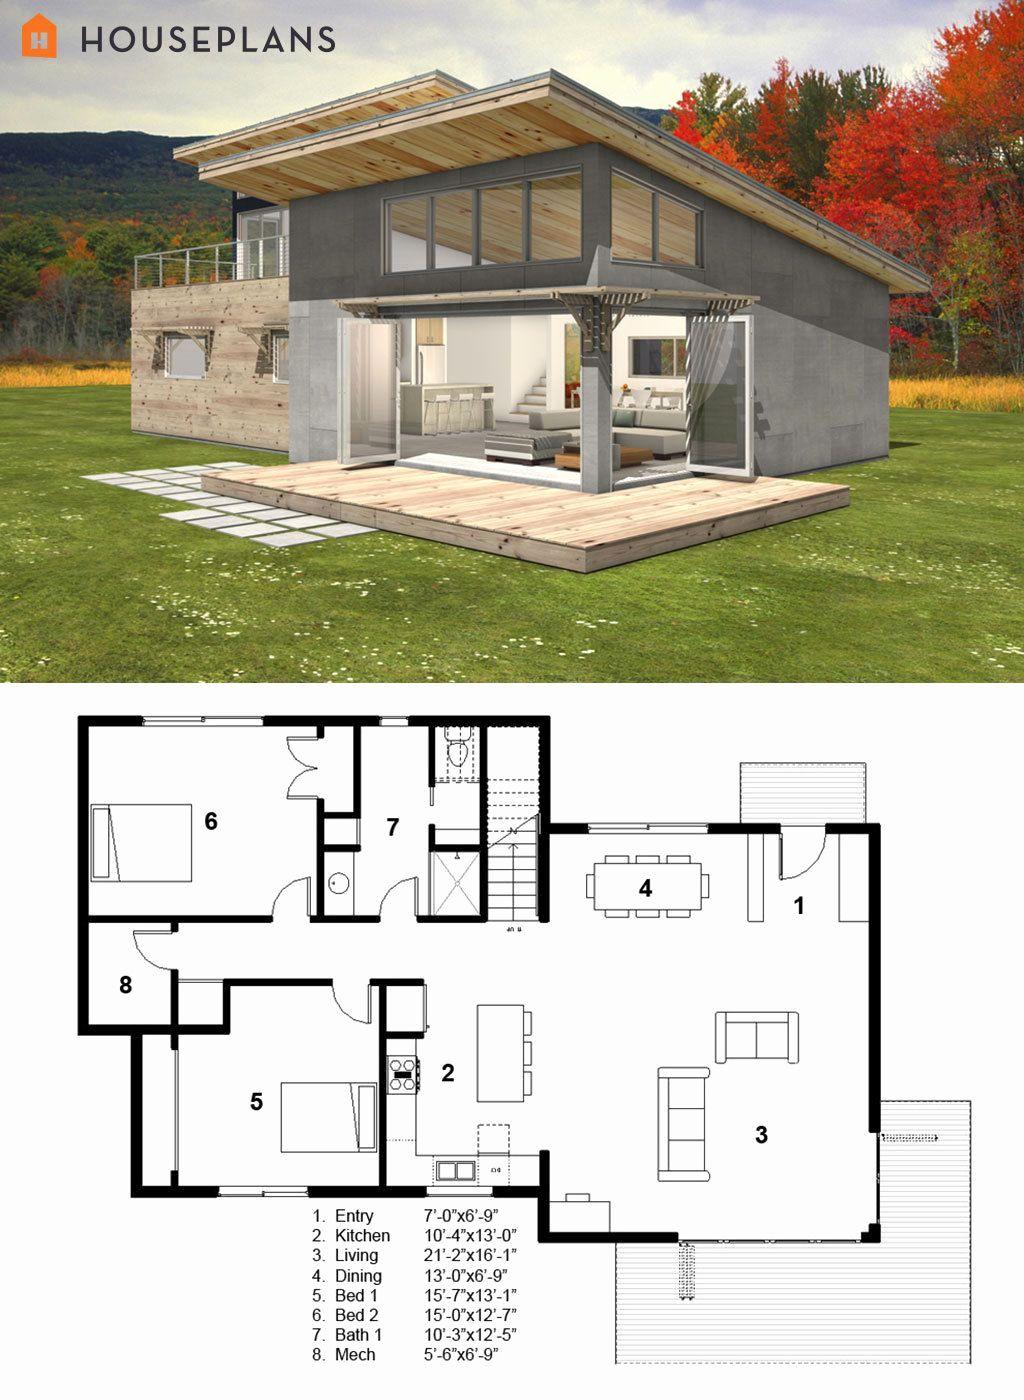 Efficiency Home Plans Fresh Efficient House Plans To Build Elegant Efficient House Plans Small Modern Style House Plans Small Modern Cabin Cabin House Plans